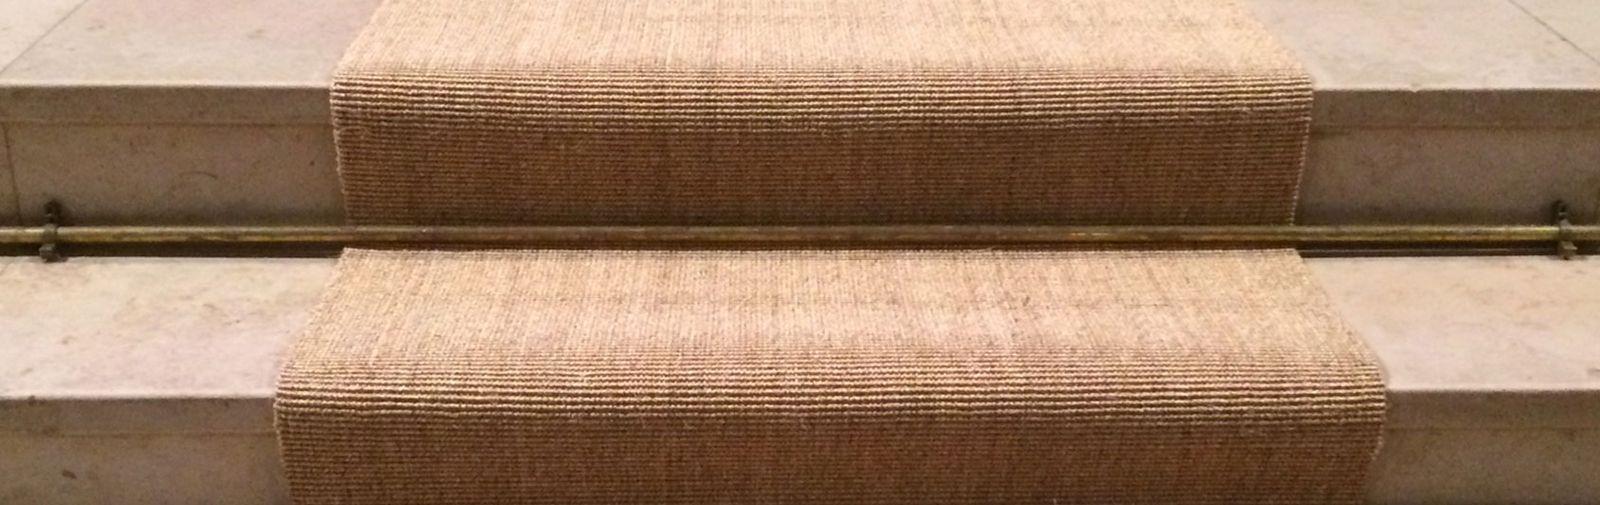 church carpet natural fibre sisal